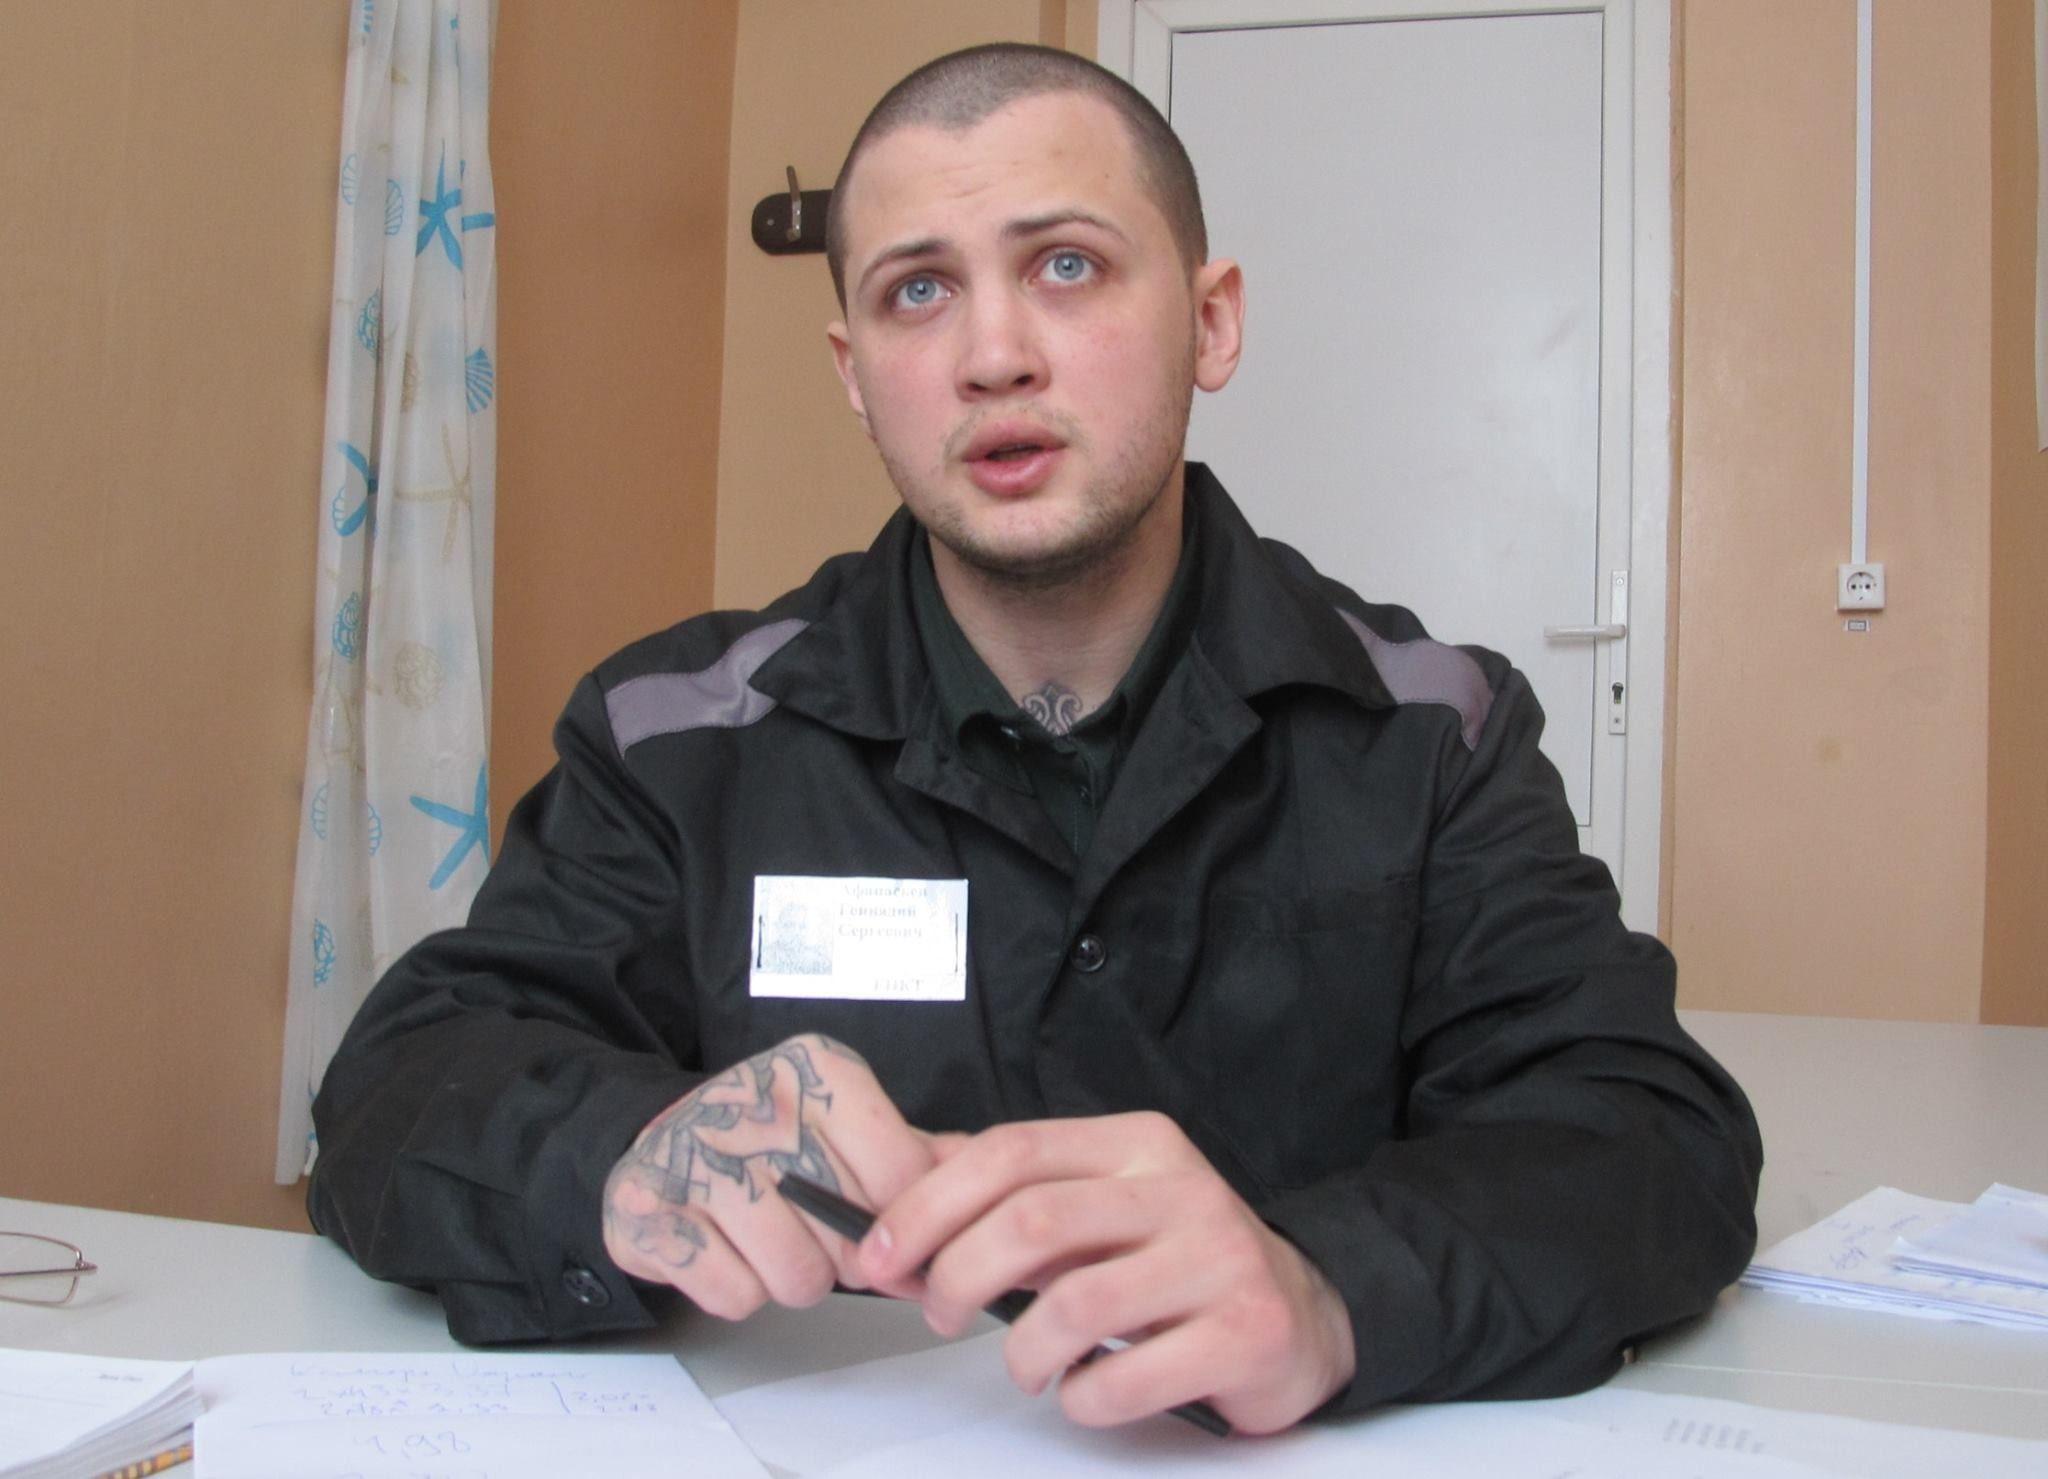 Геннадий Афанасьев / Facebook Эрнест Мезак